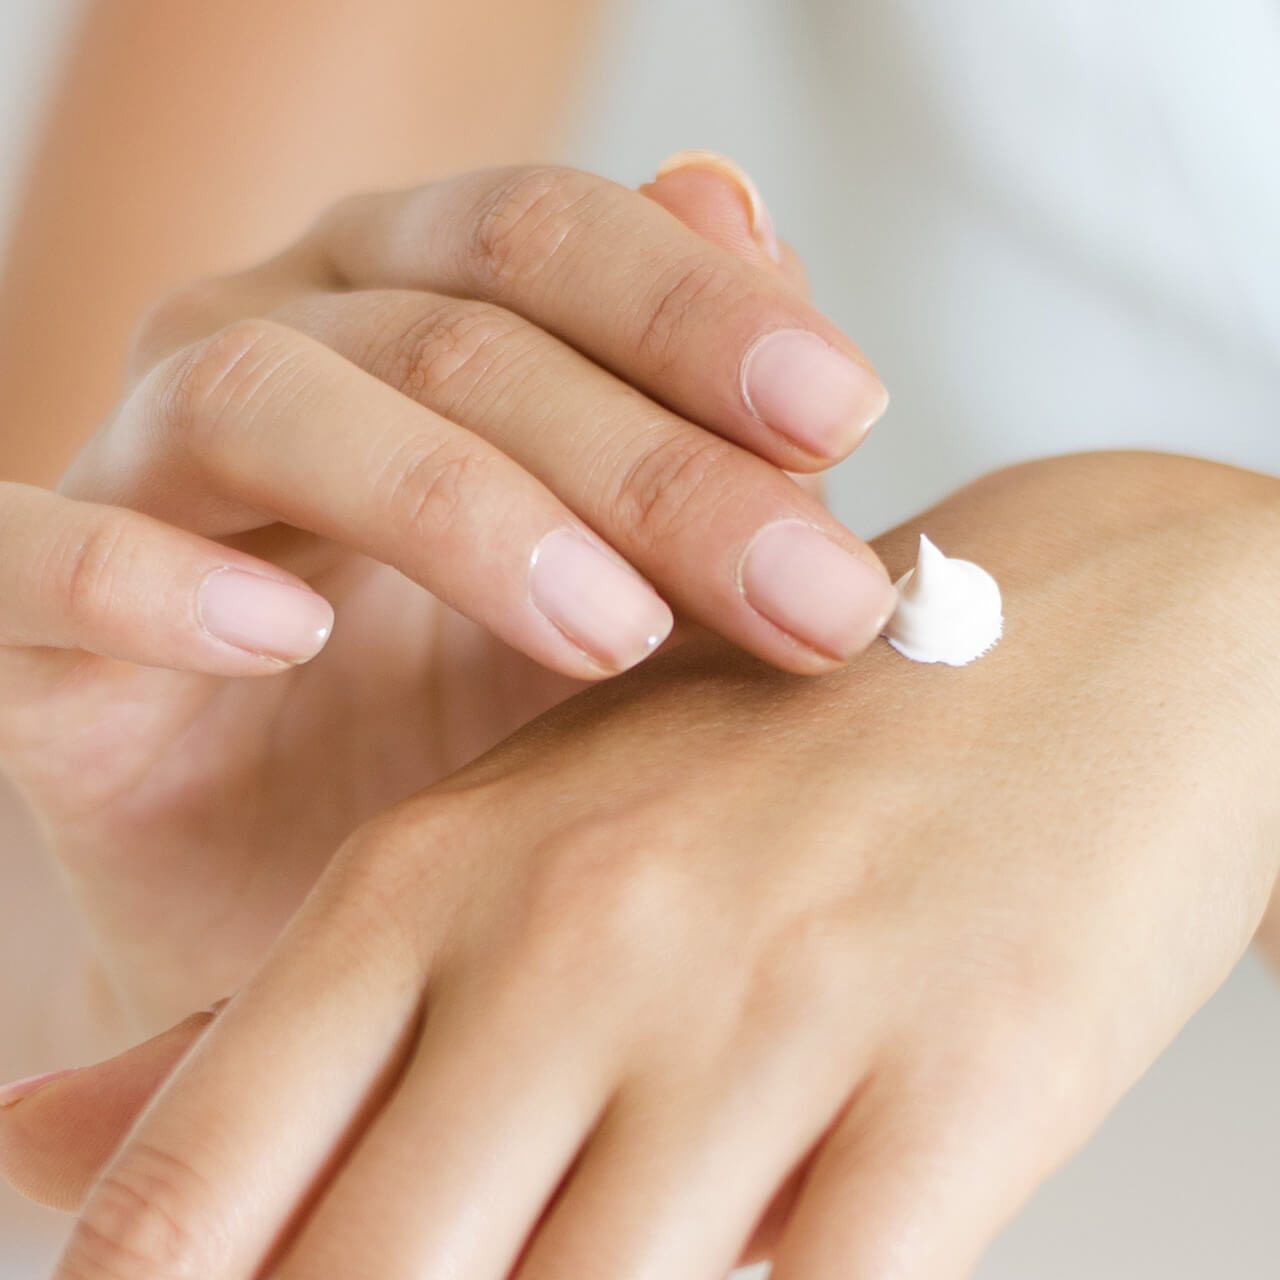 Recipes: Non-Greasy Hand & Body Cream with Skin Type